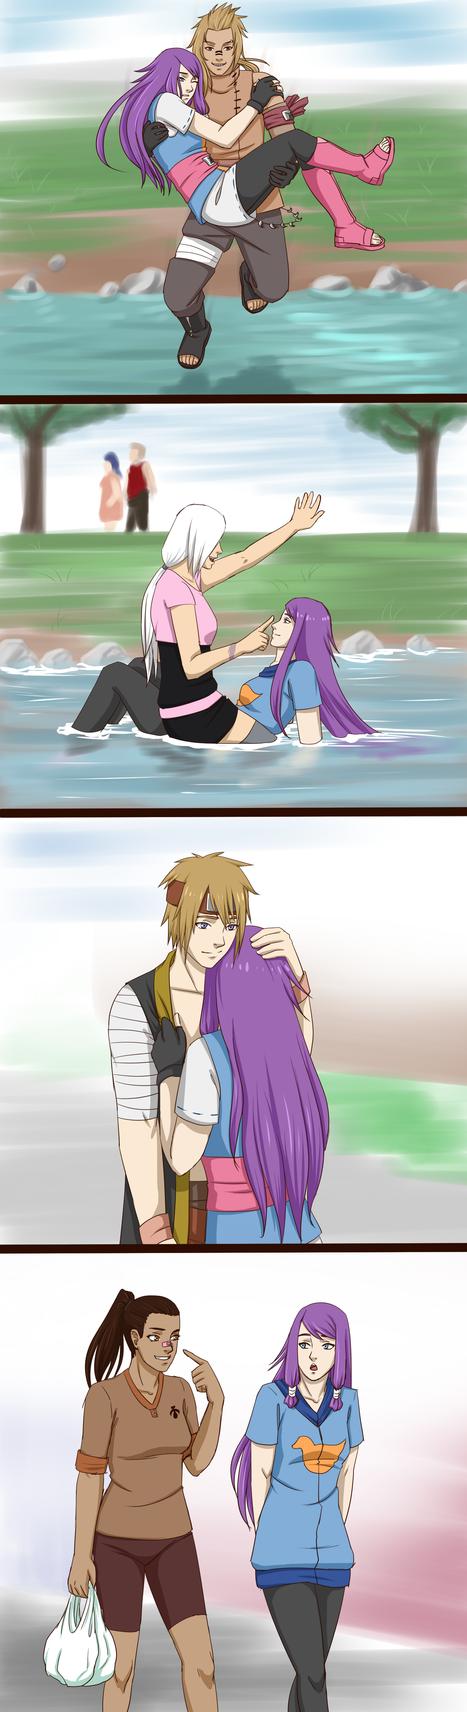 Hikari doodle 2 by RamonaChan